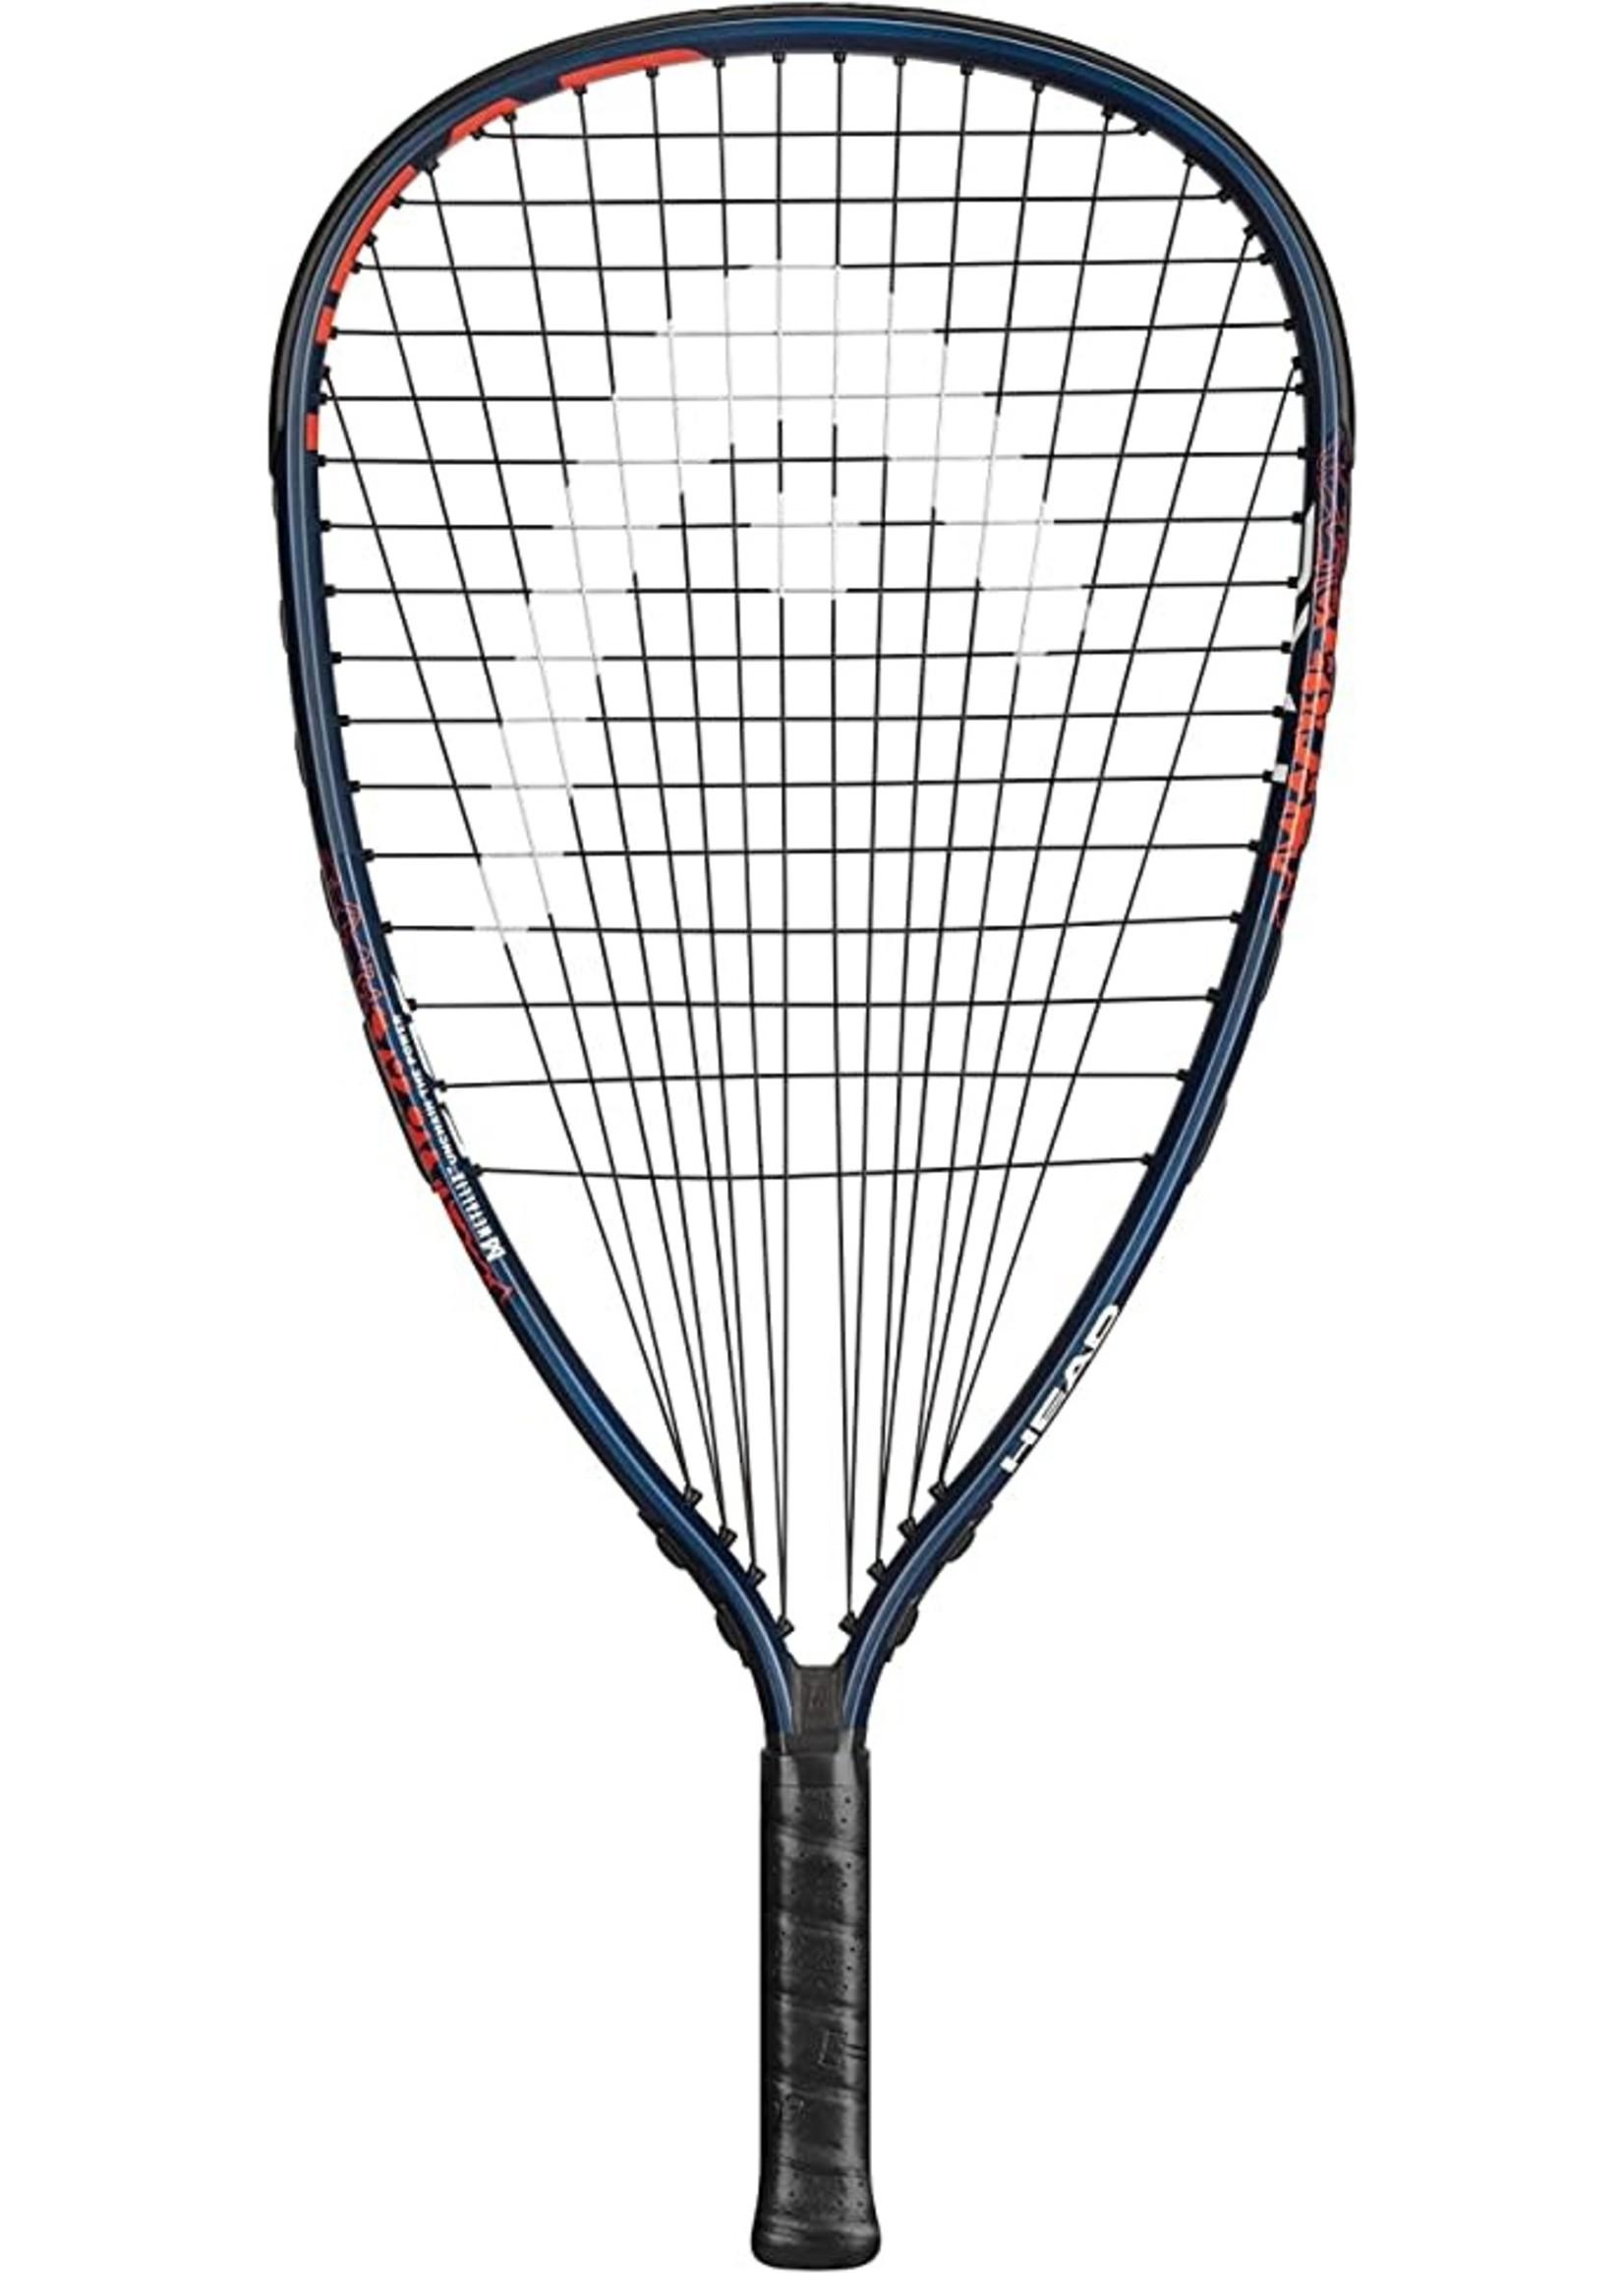 Head Head MX Fire Racketball Racket (2021)